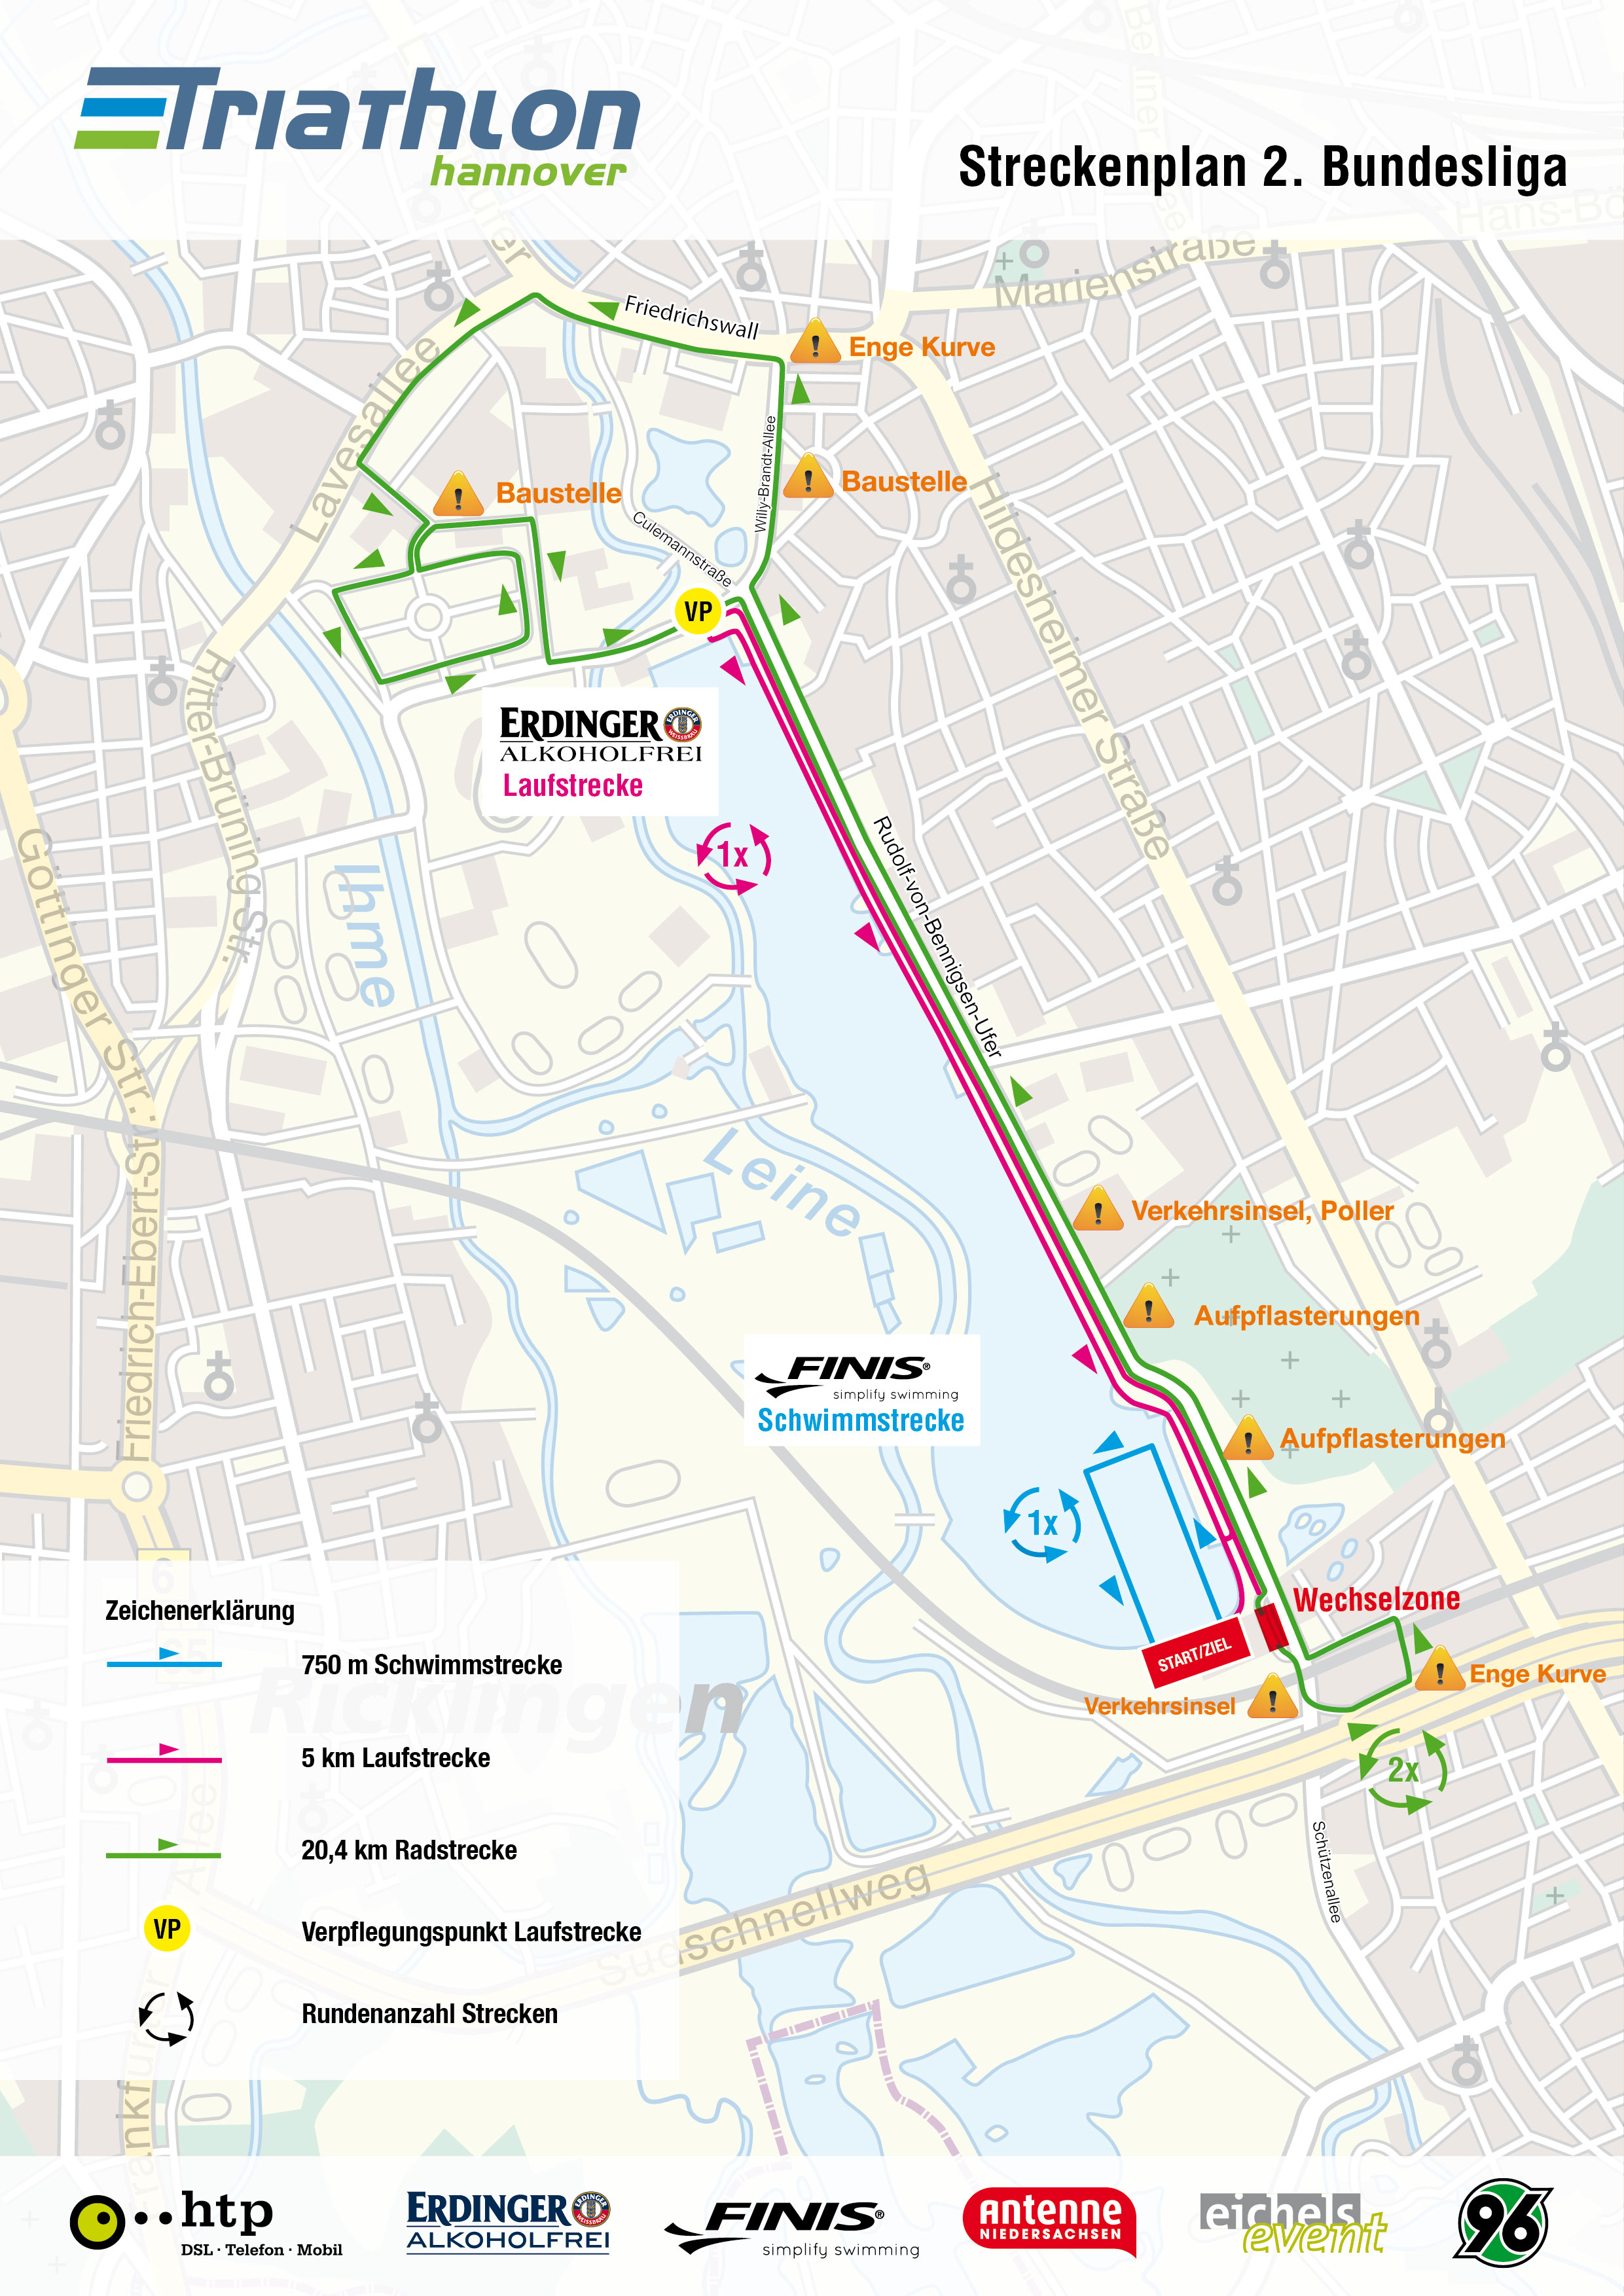 triathlon 2. bundesliga